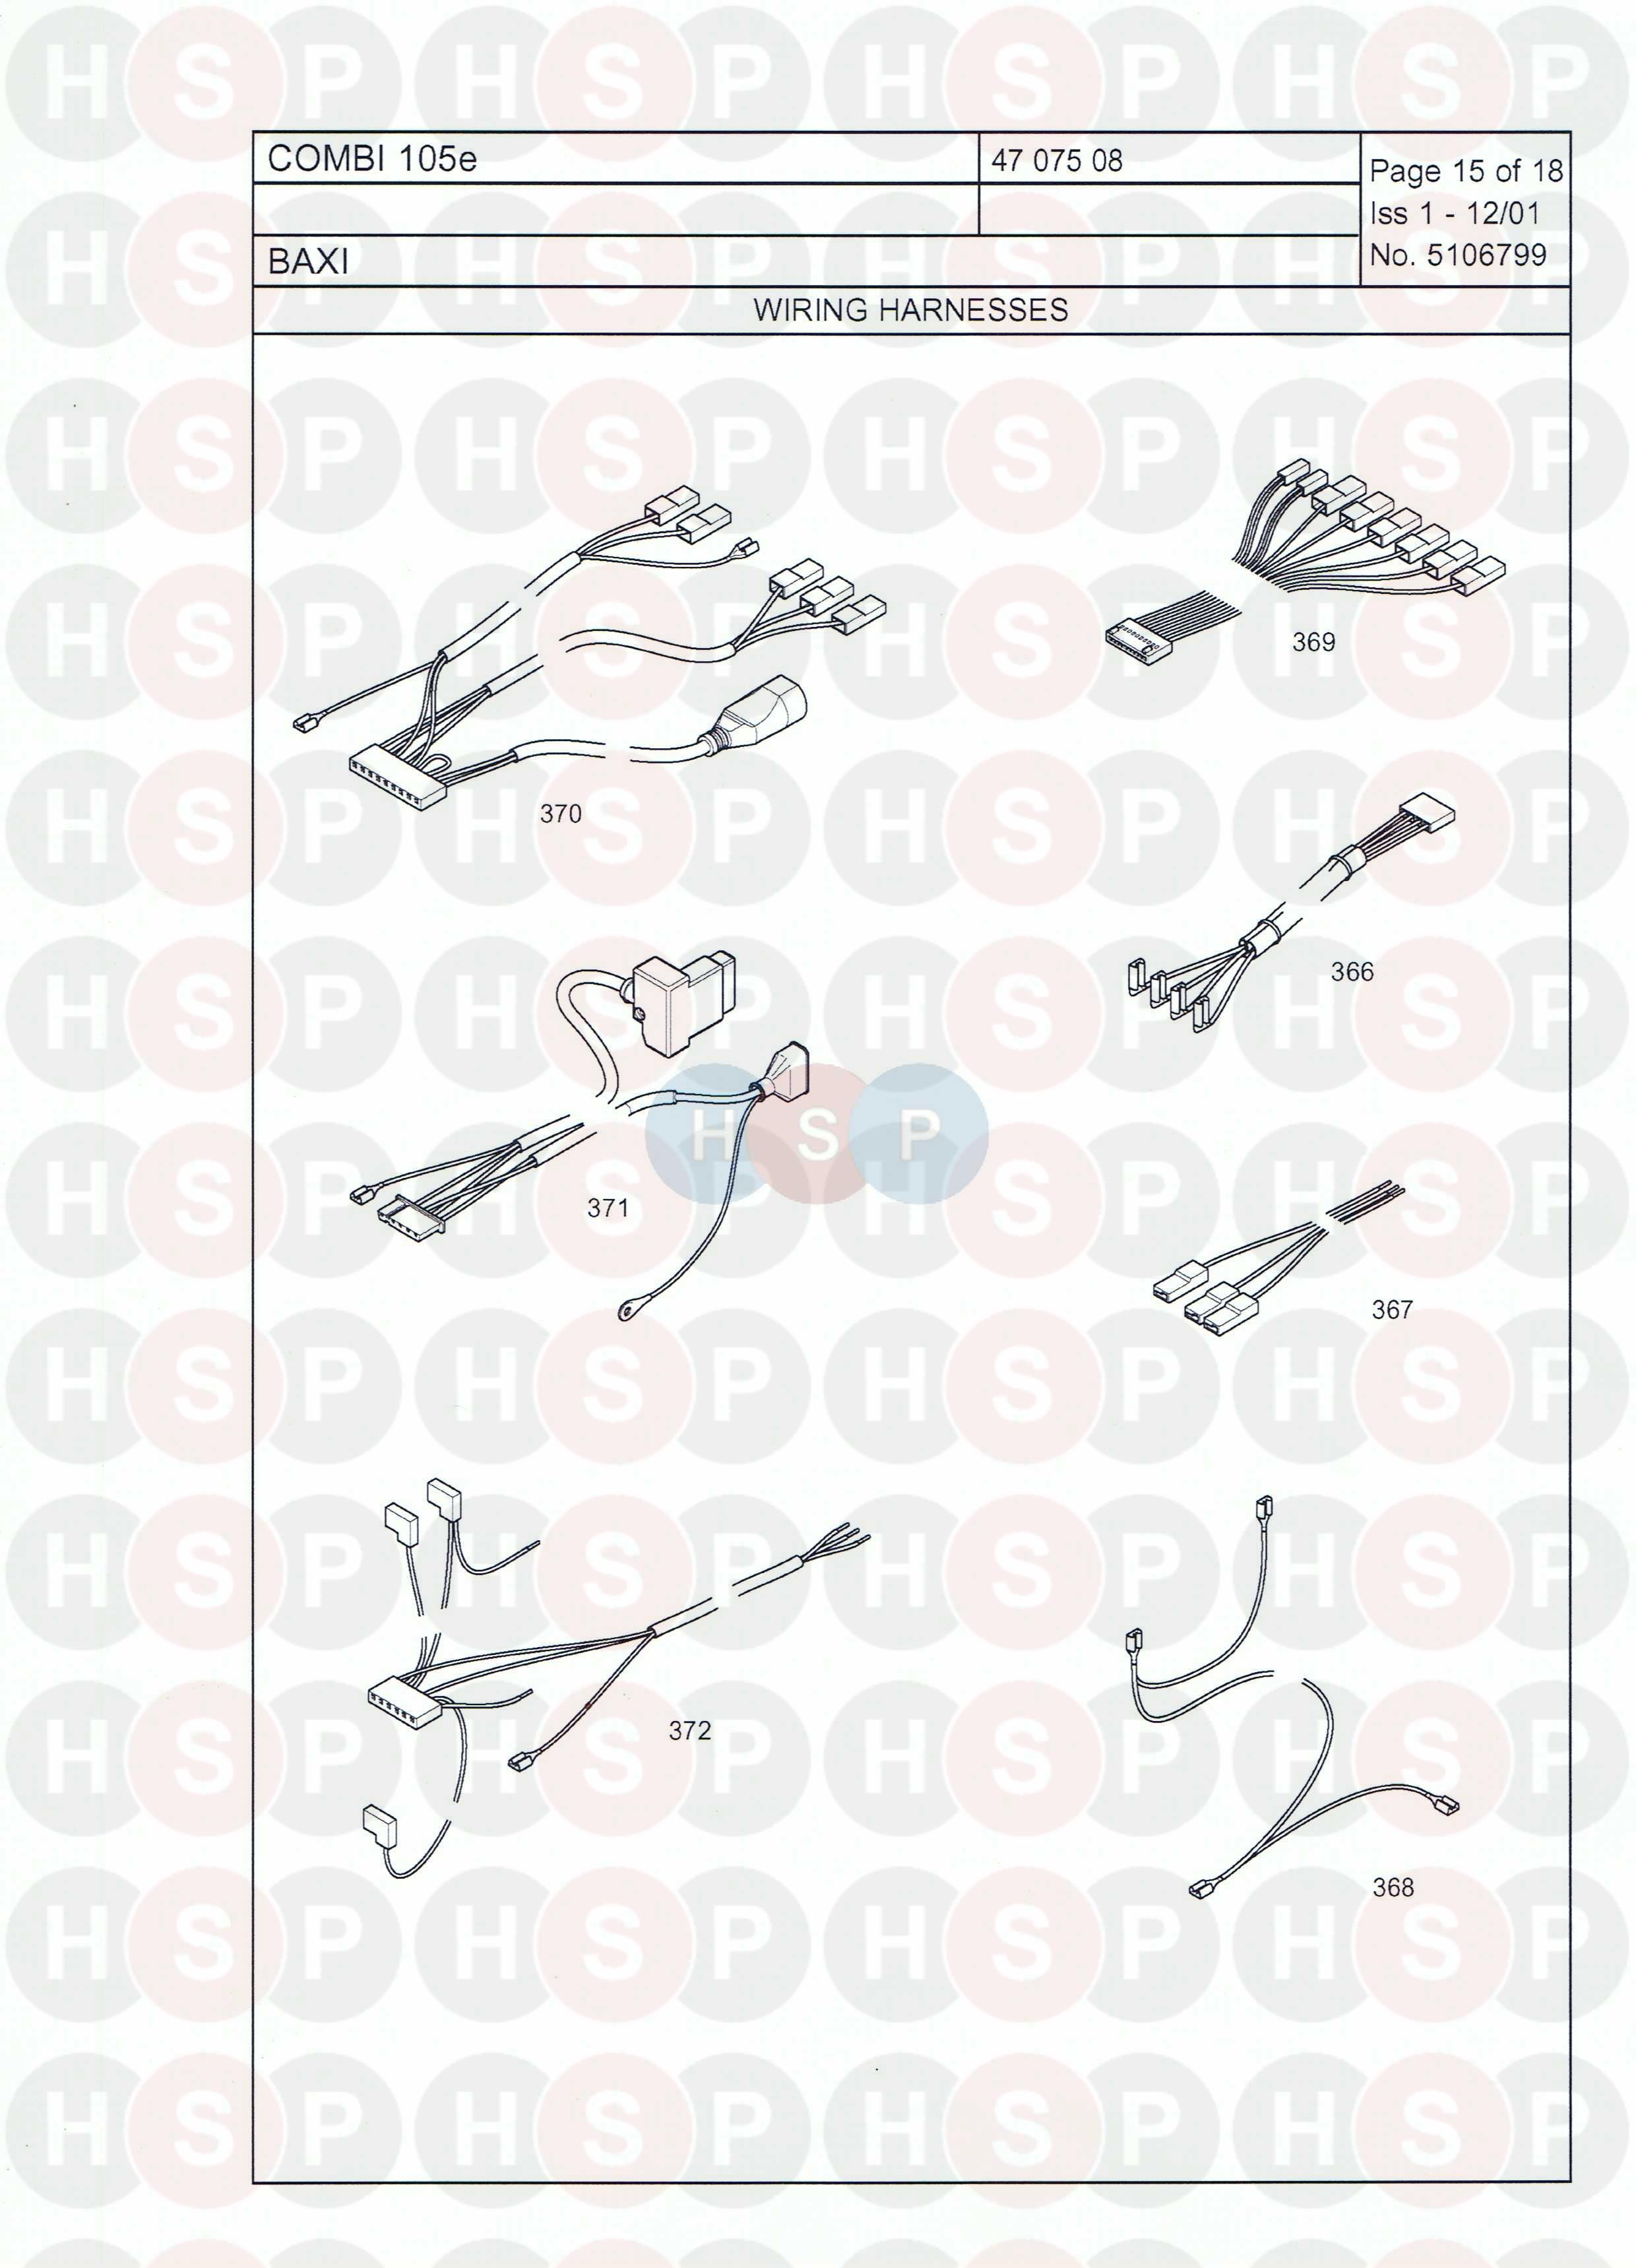 baxi combi 105e  wiring  diagram